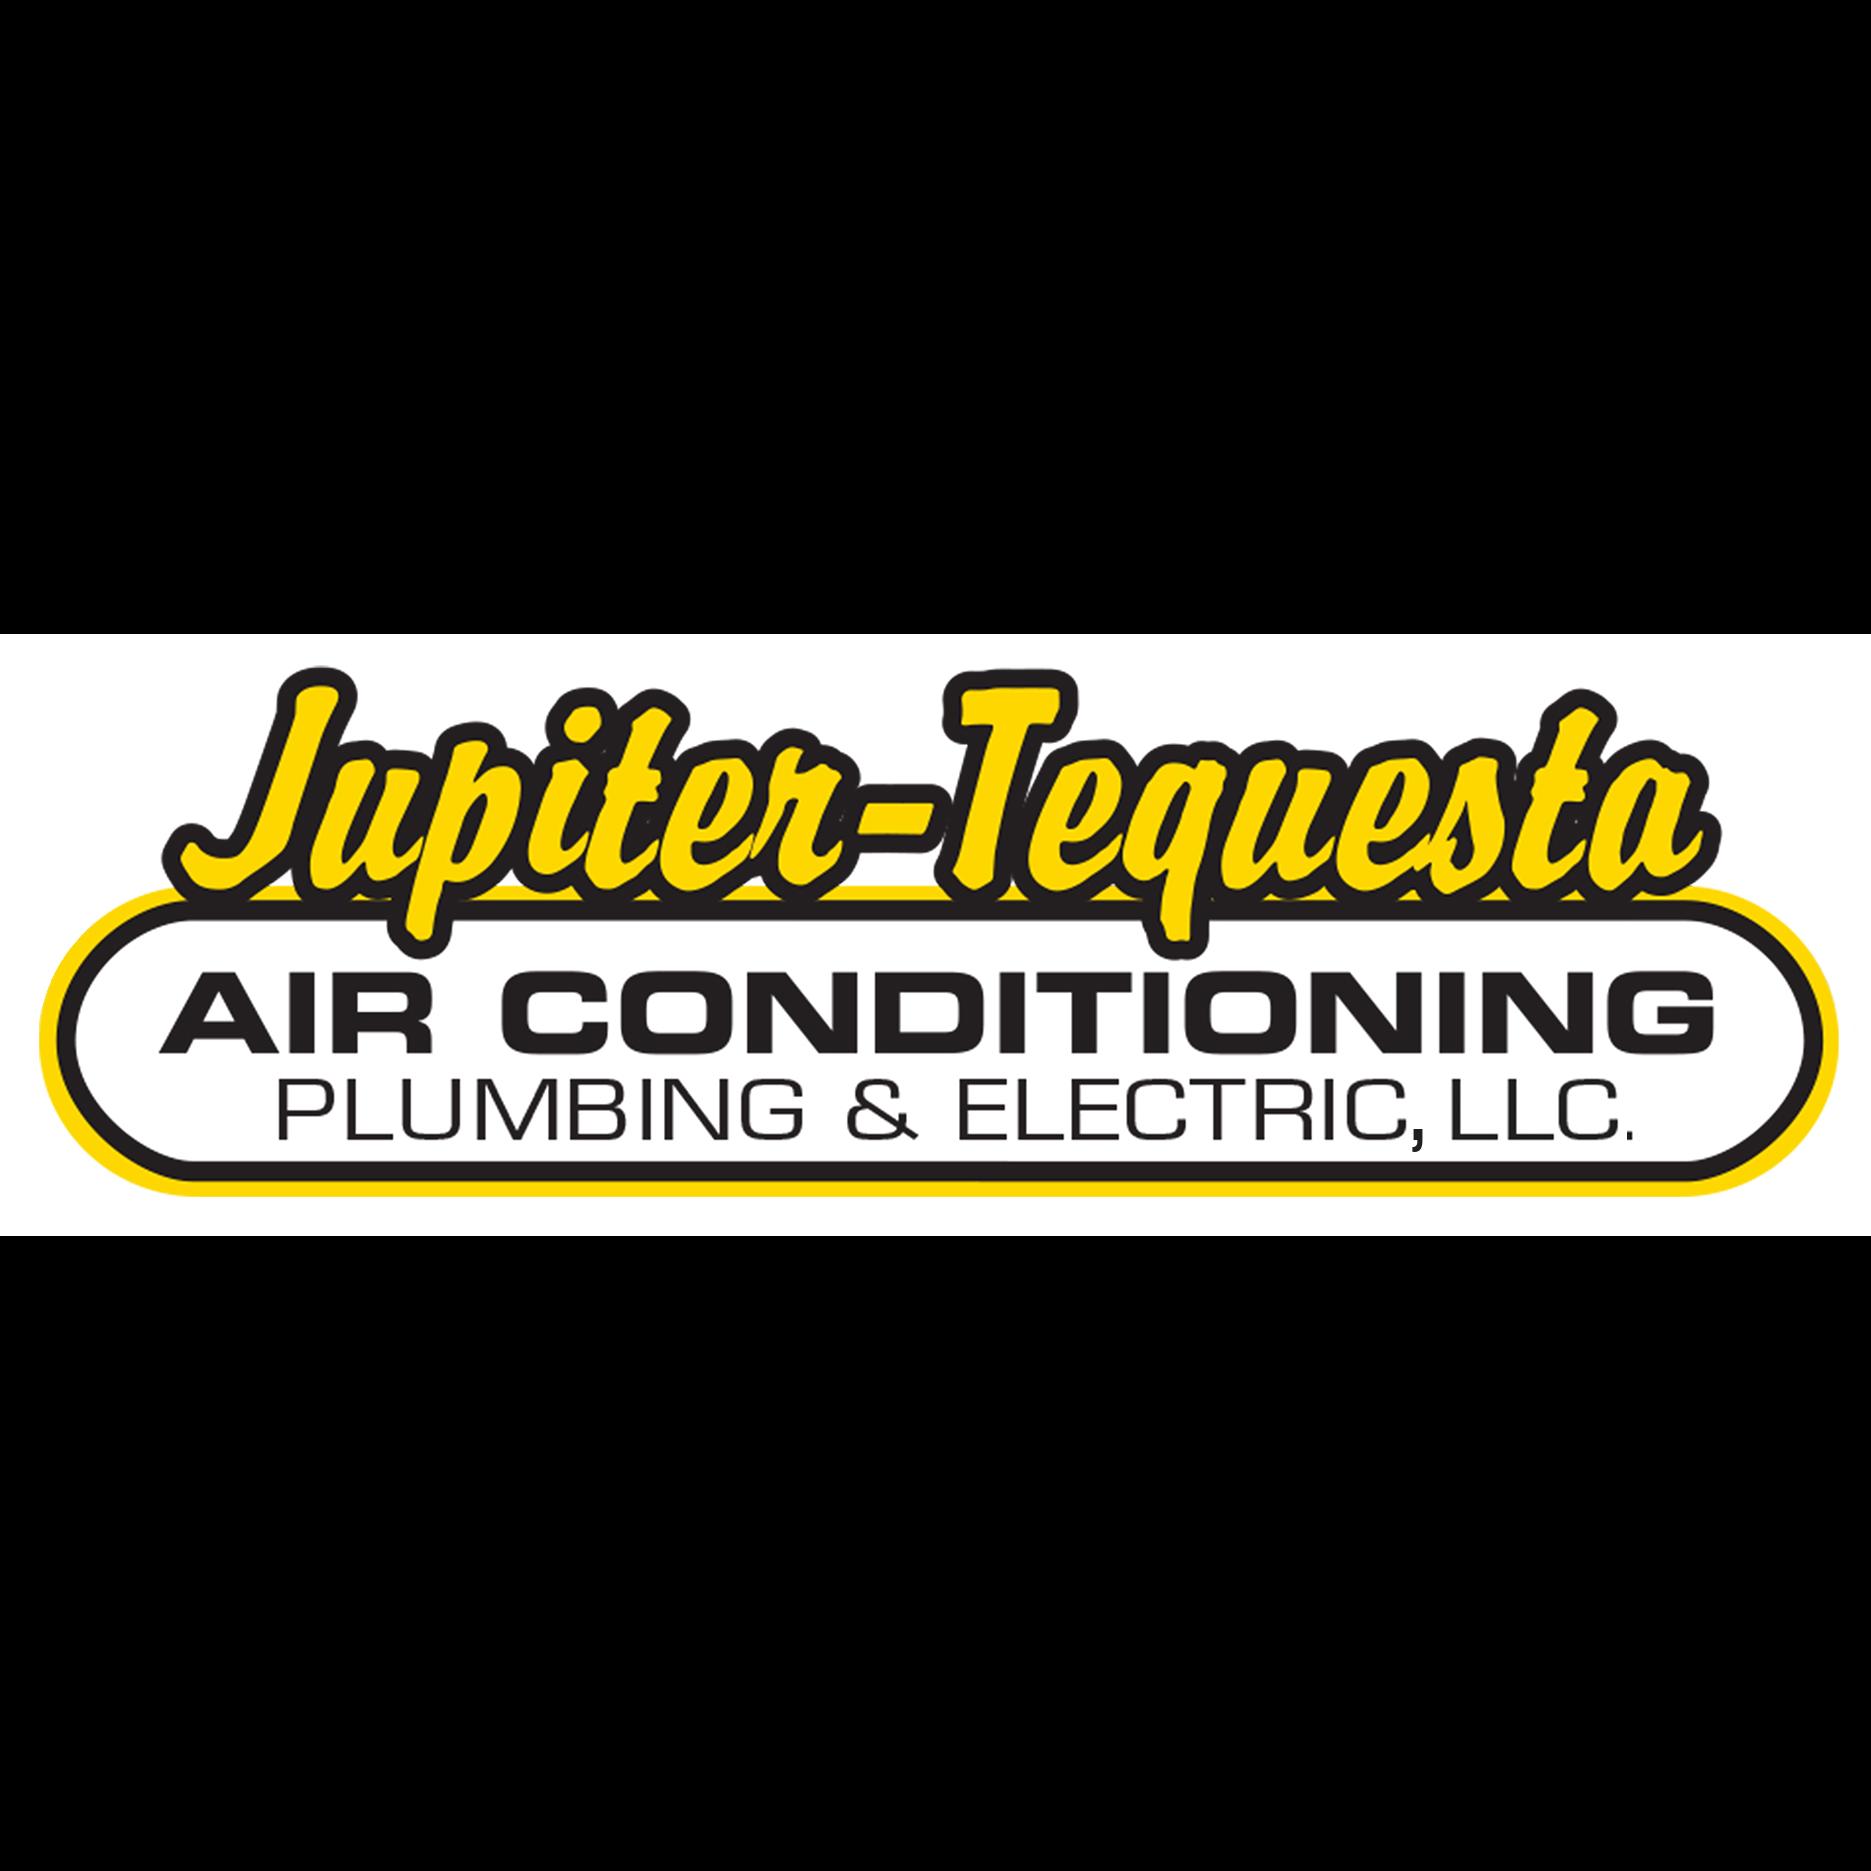 Jupiter-Tequesta A/C, Plumbing & Electric, LLC.